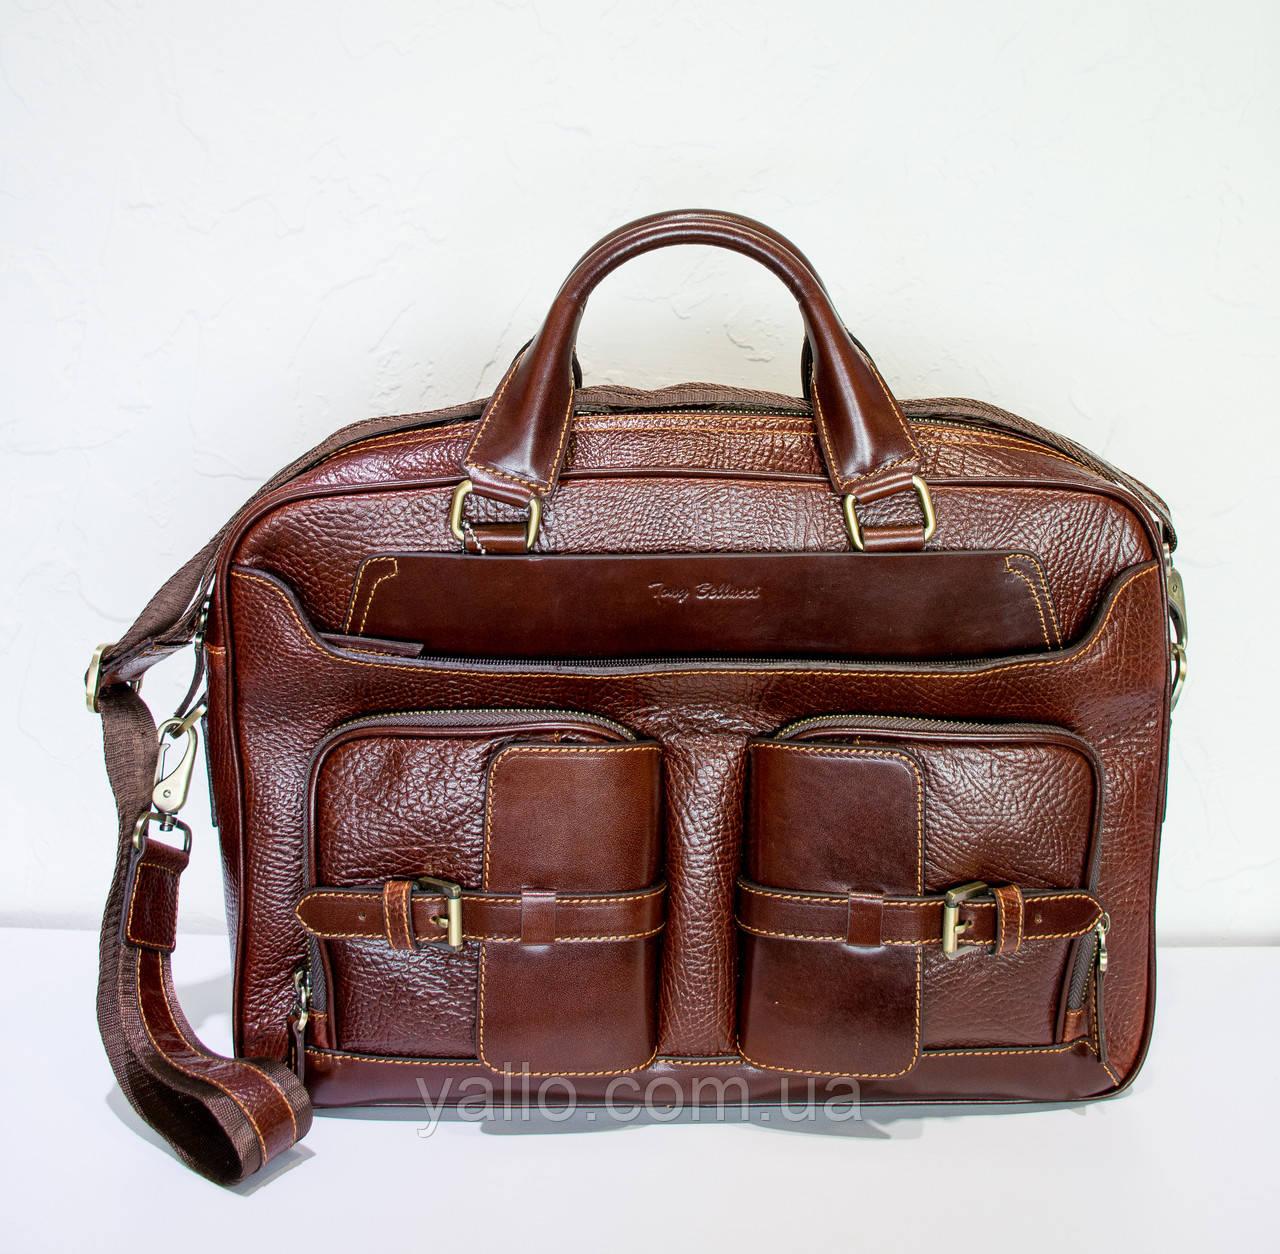 Натуральная кожаная сумка для мужчин Tony Bellucci T5014-896